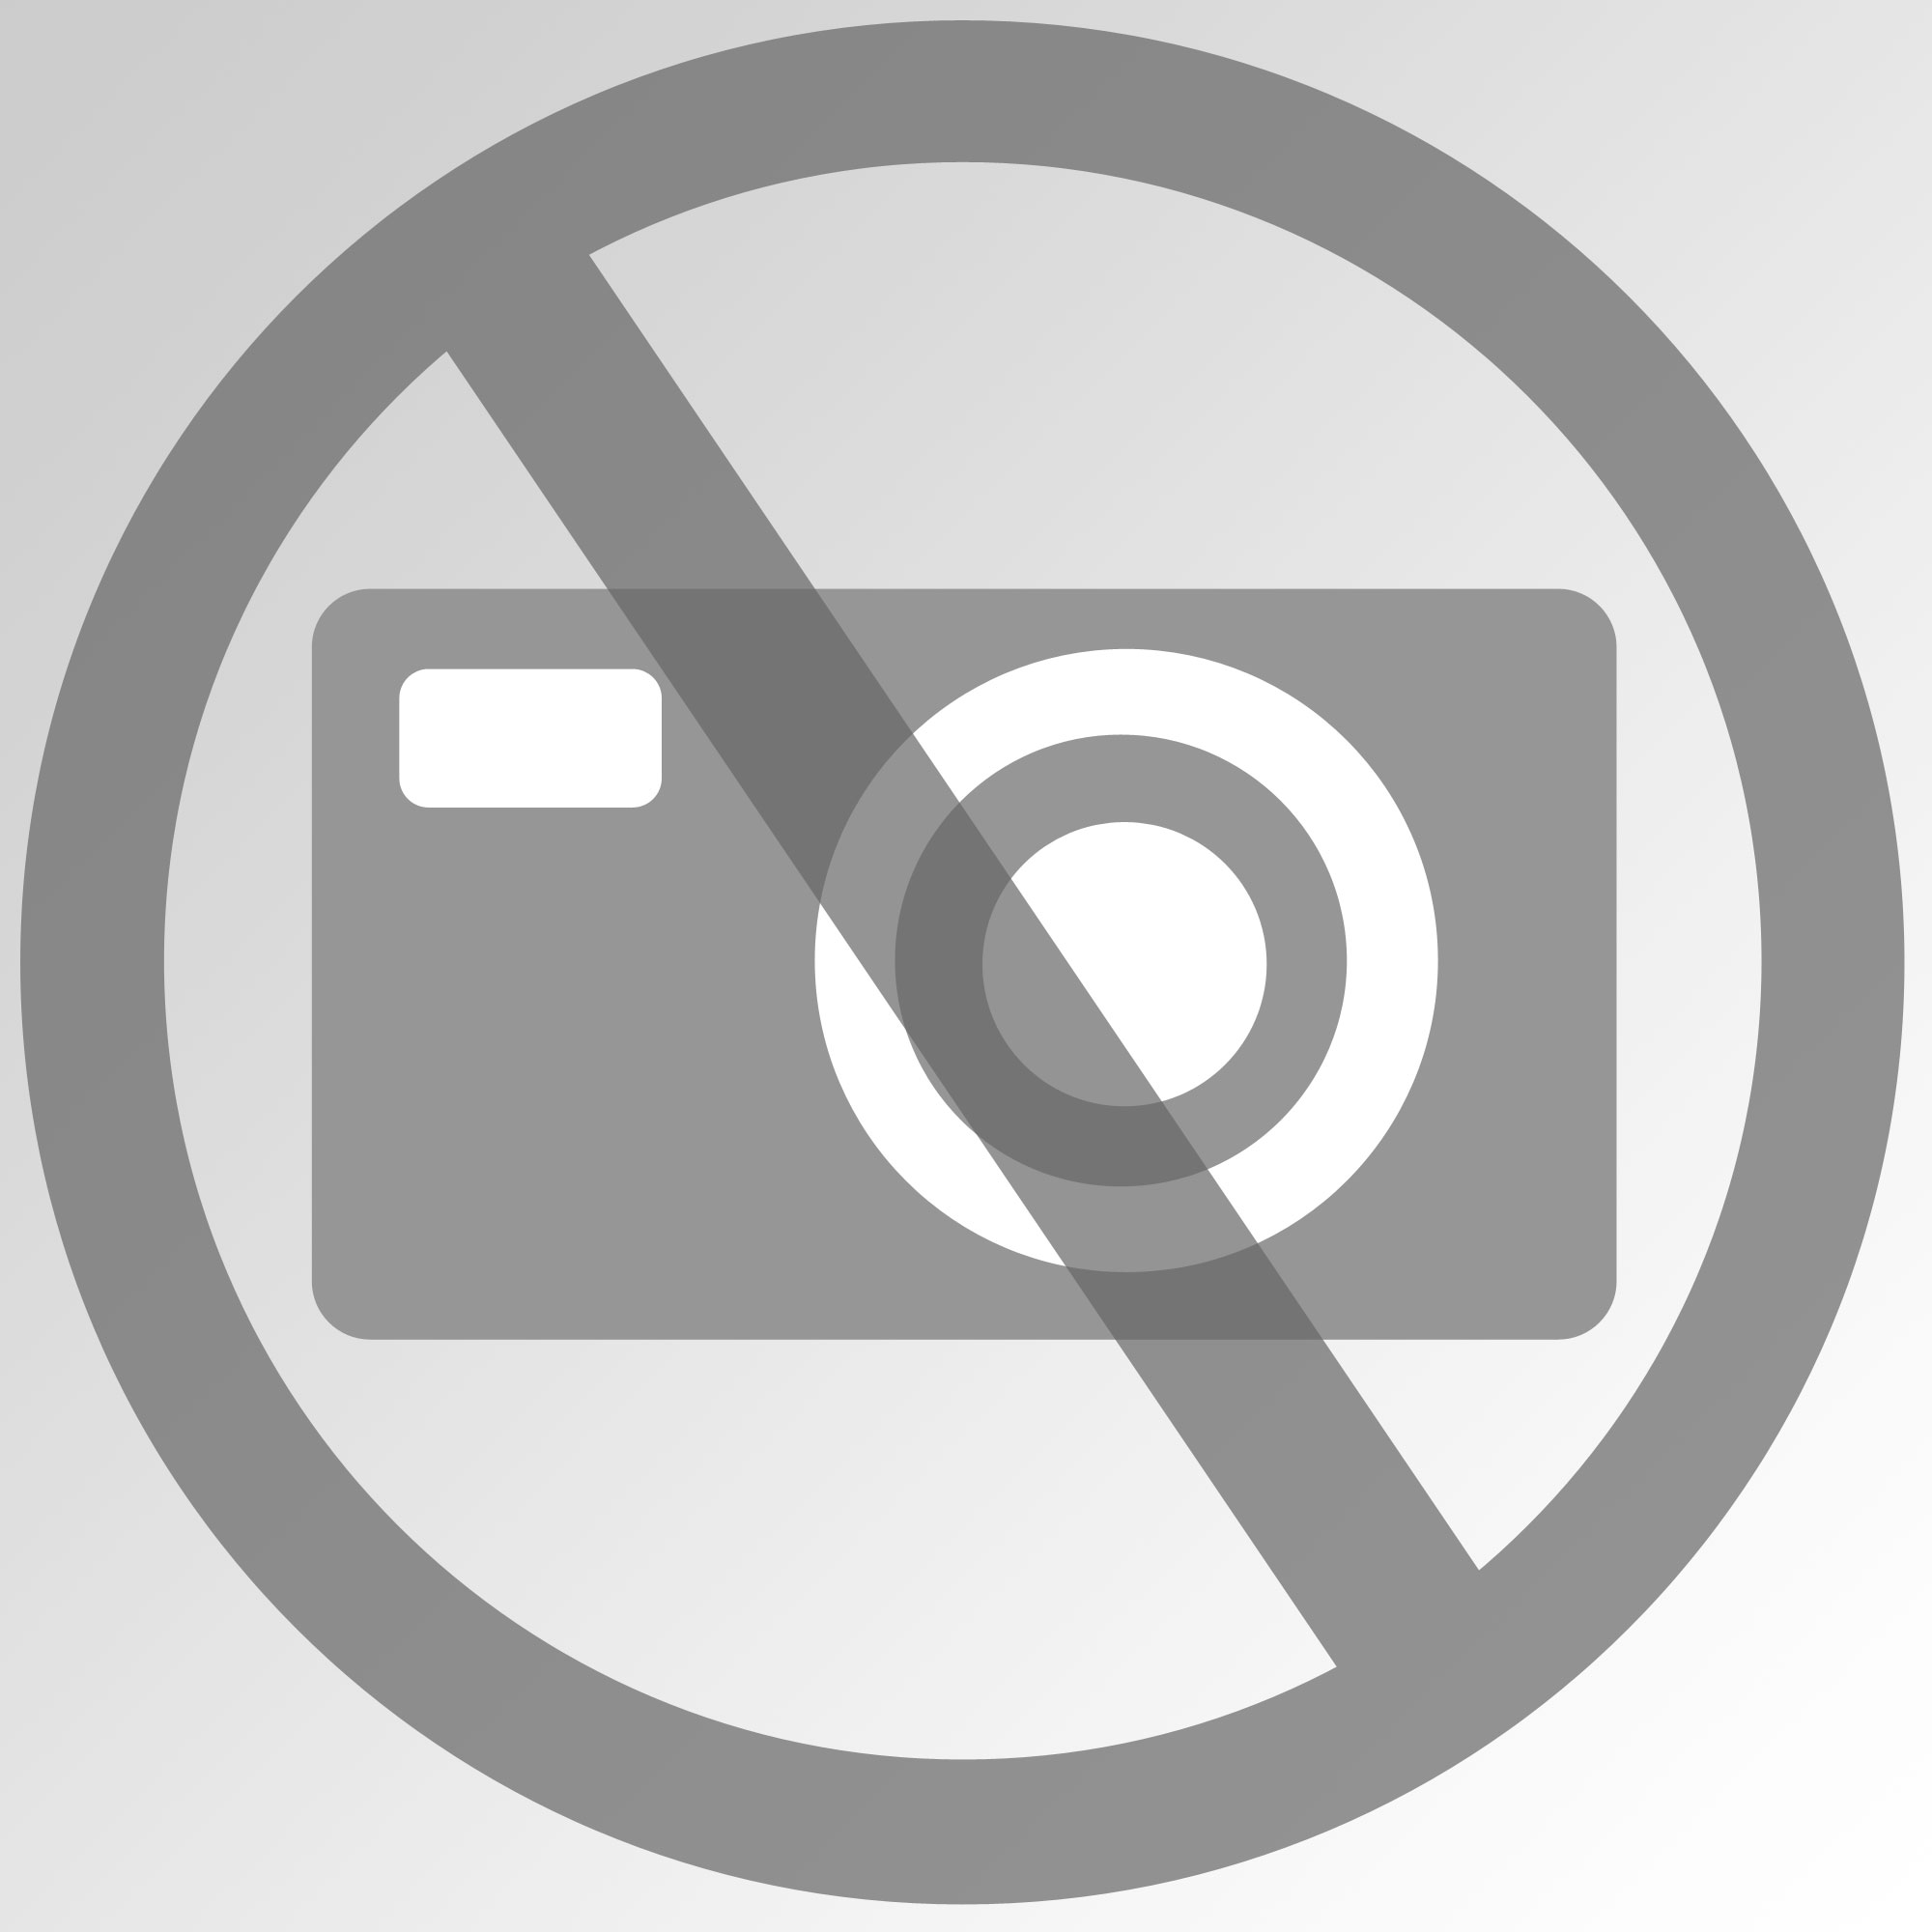 FIXXX-Secondomopp offene und geschlossene Fransen